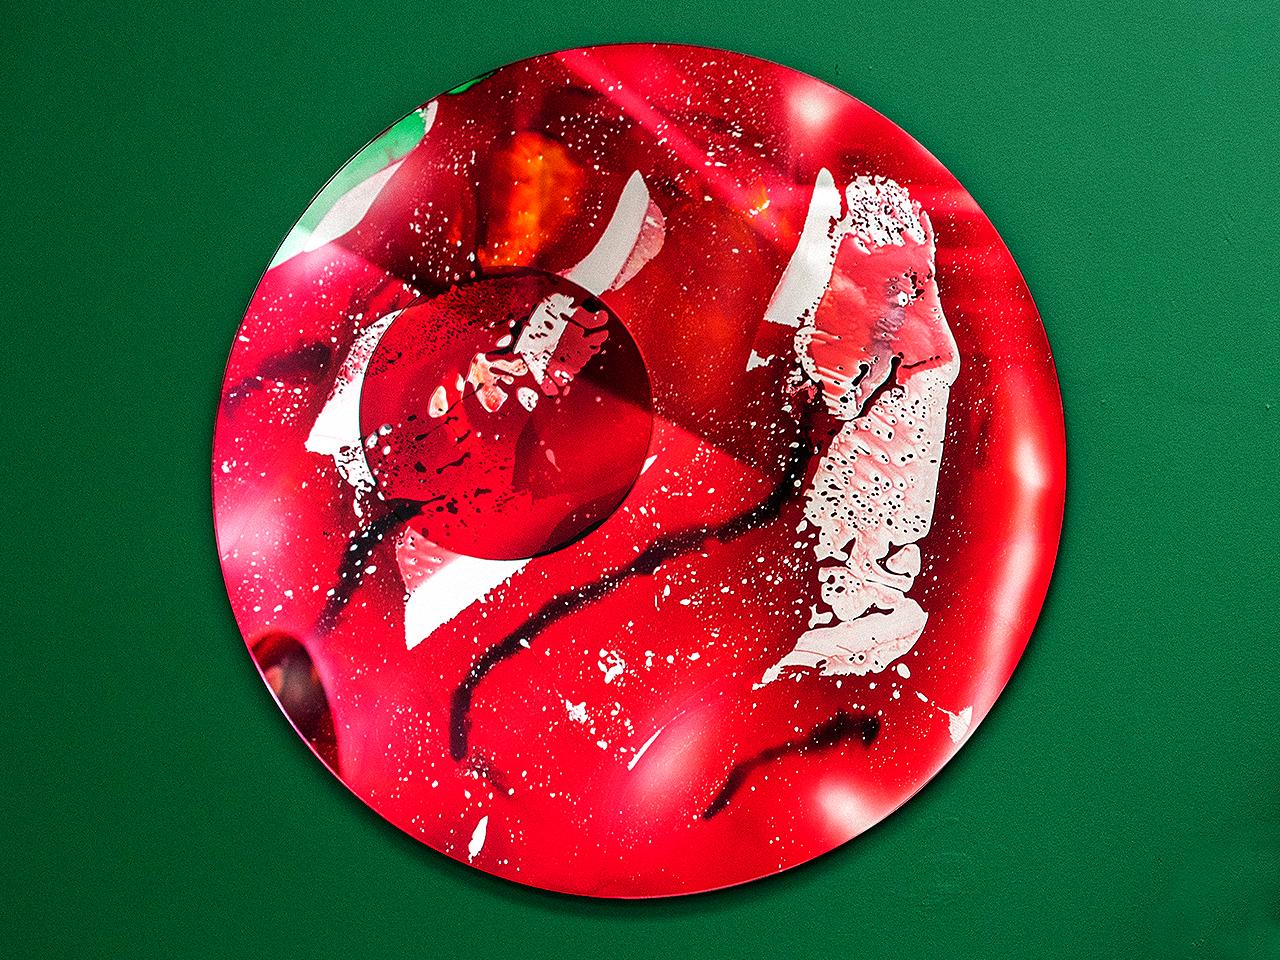 infrared camera, 2019 glas UV glue, 96 cm